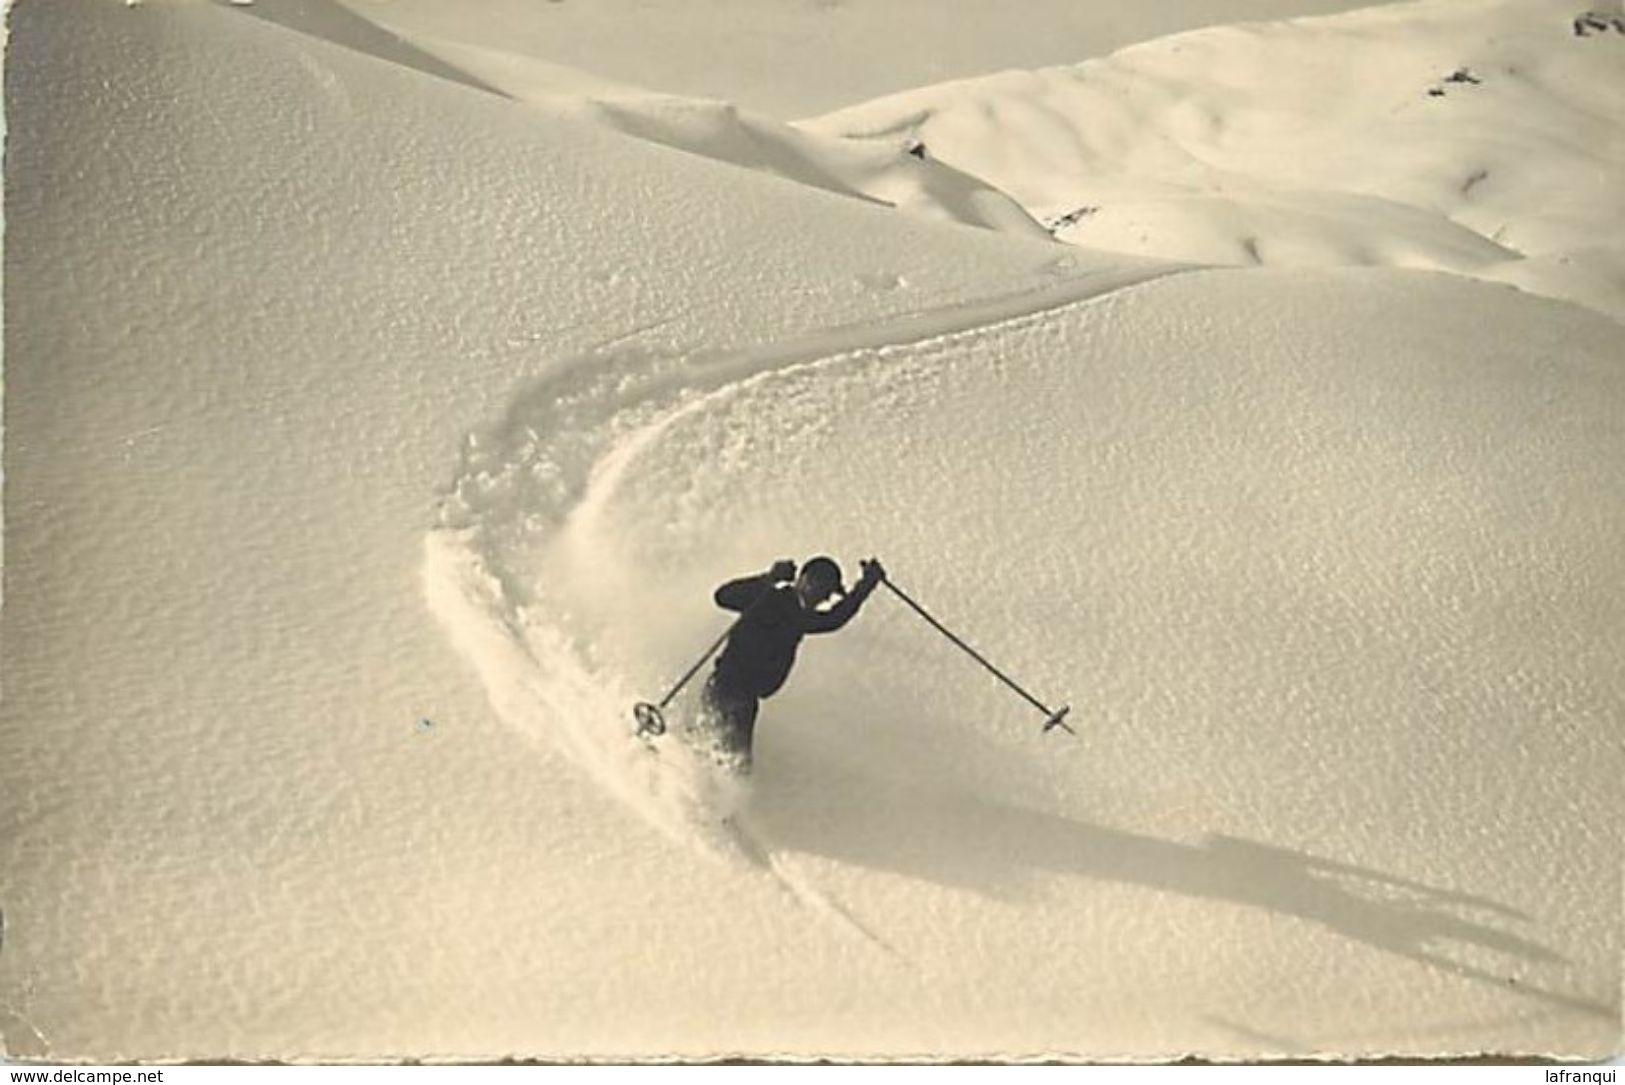 Themes Div - Ref W556- Sports D Hiver - Ski - Skieur - Telemark Im Skigelande  Bei Adelboden - - Sports D'hiver